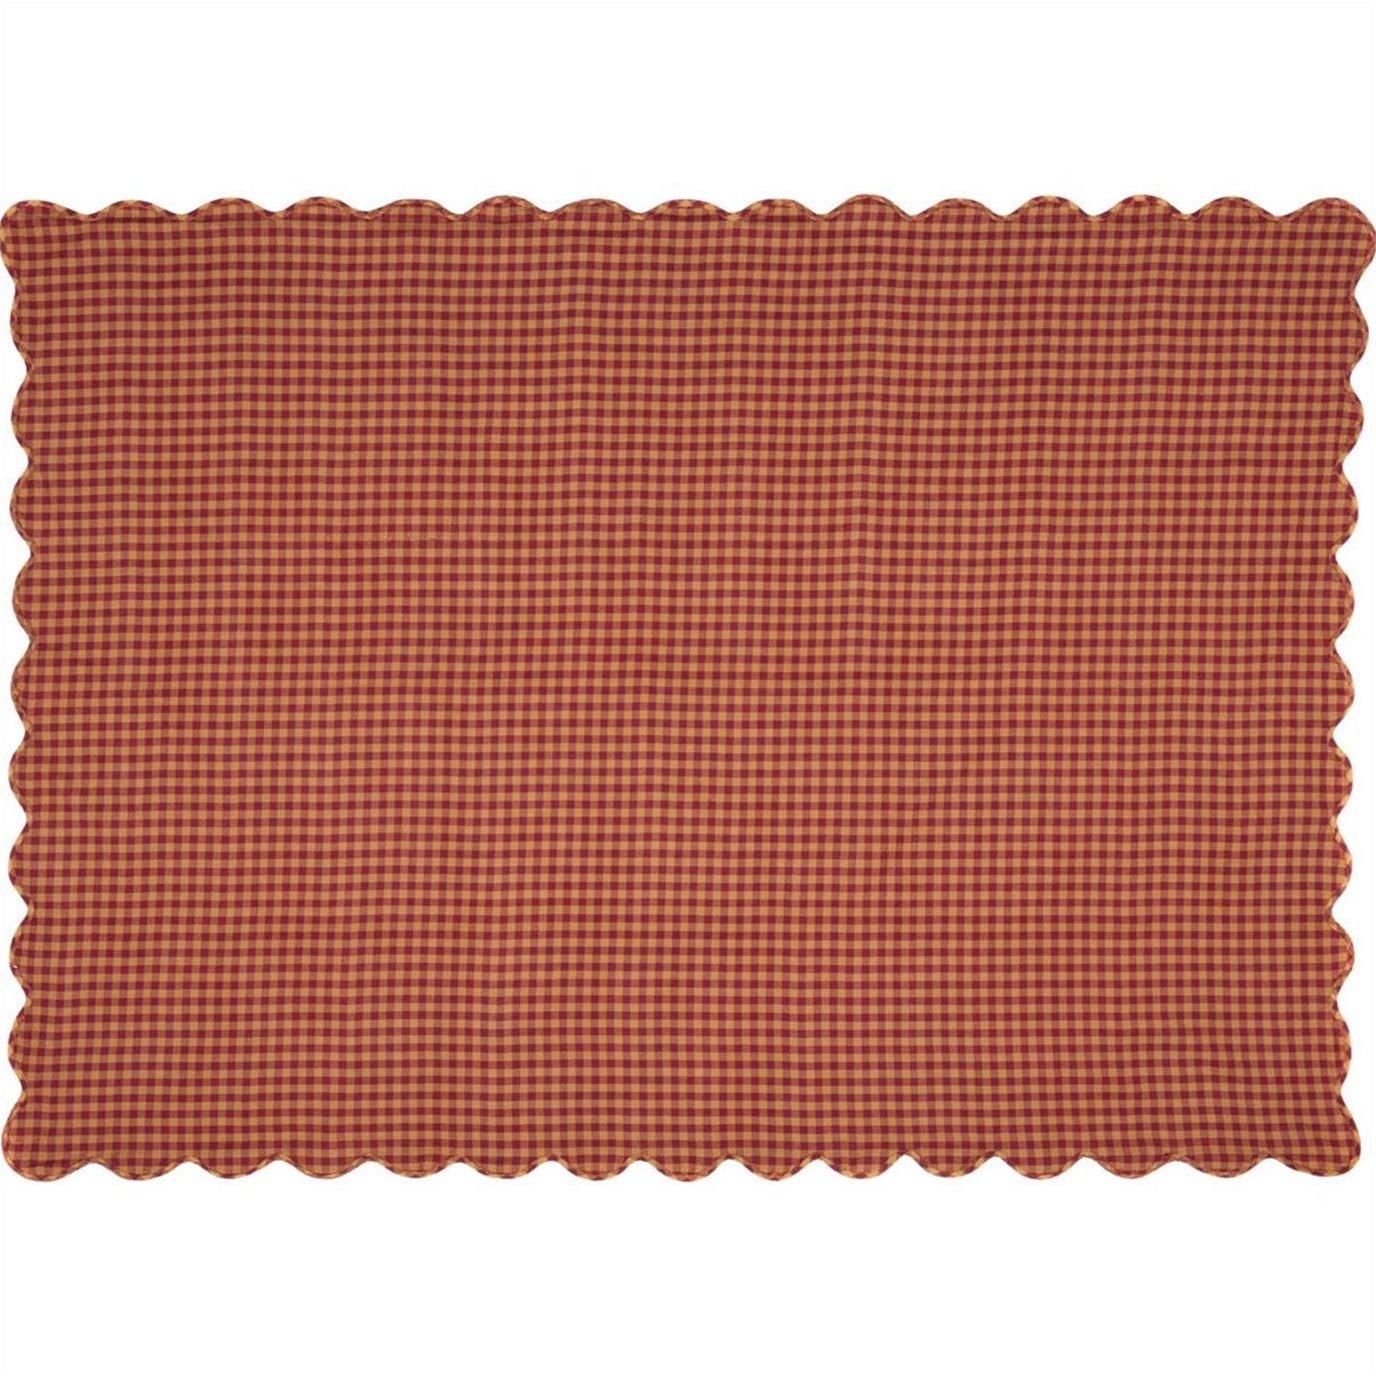 Burgundy Check Scalloped Table Cloth 60x80